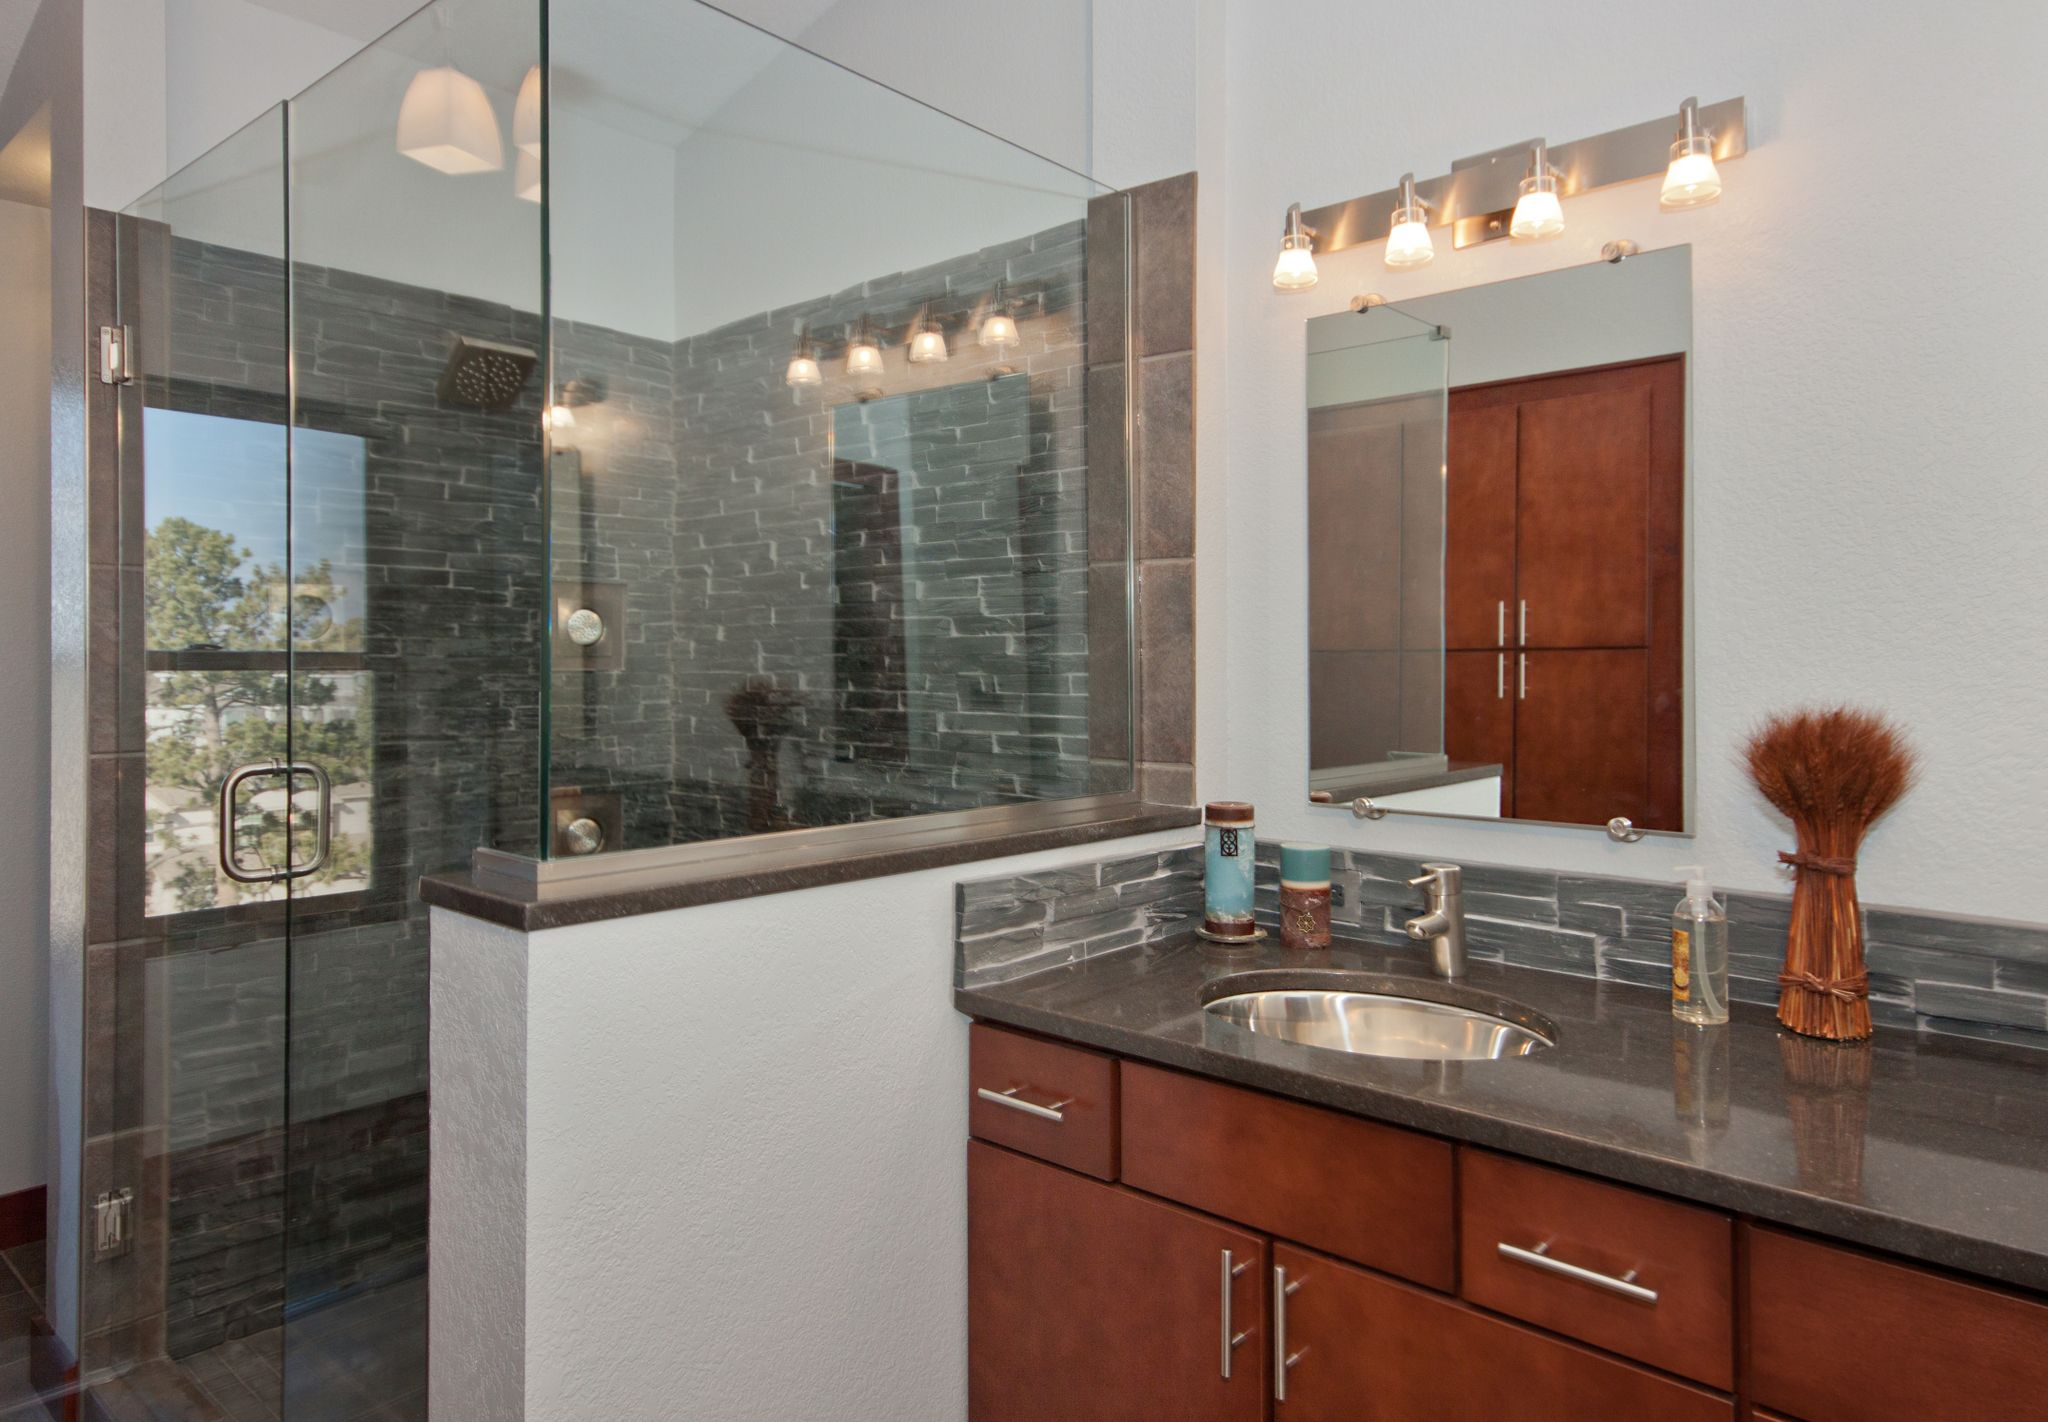 Vanity Short View with Shower (2).jpg